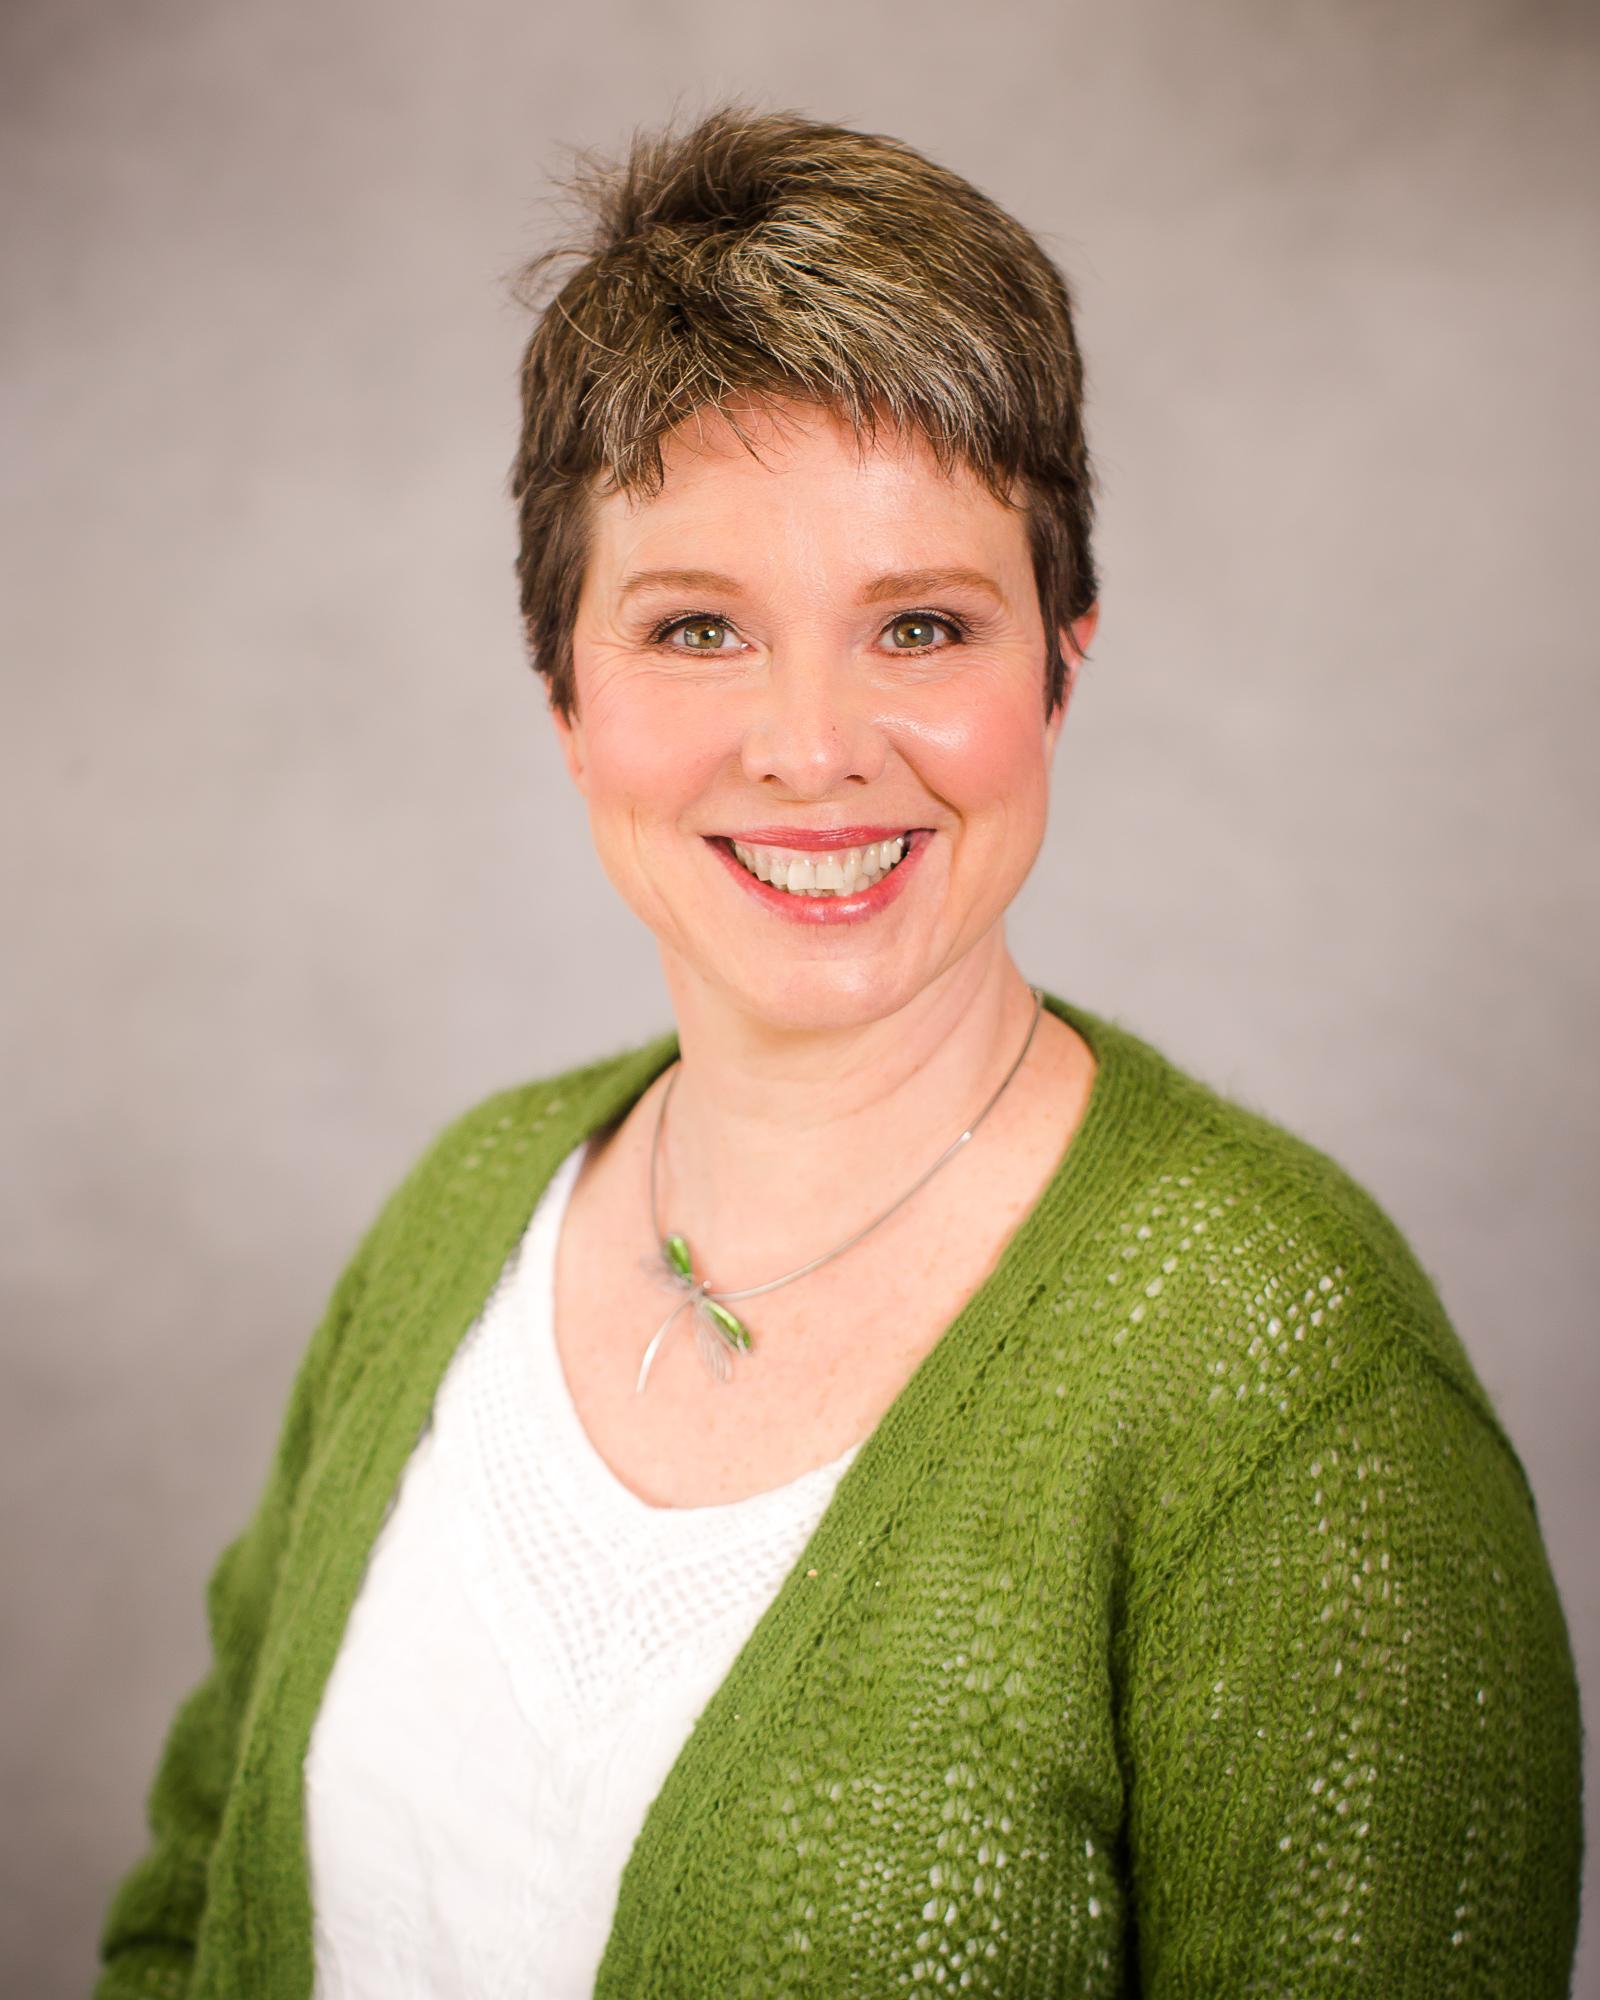 Nathalie Bonafe, PhD